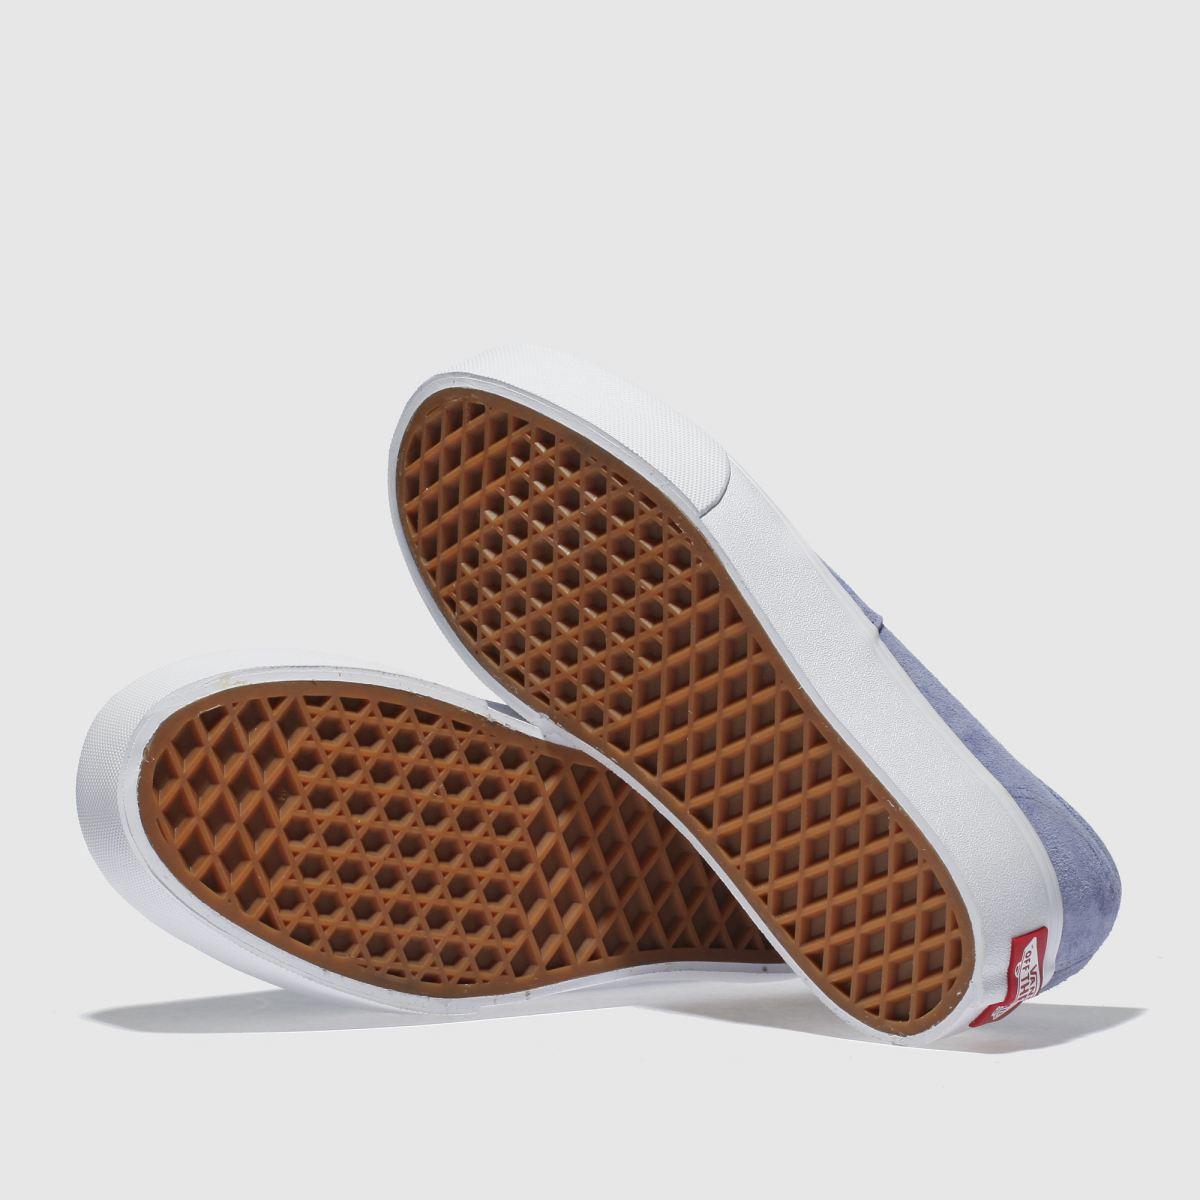 Damen 2.0 Hellblau vans Authentic Platform 2.0 Damen Sneaker | schuh Gute Qualität beliebte Schuhe 375b37